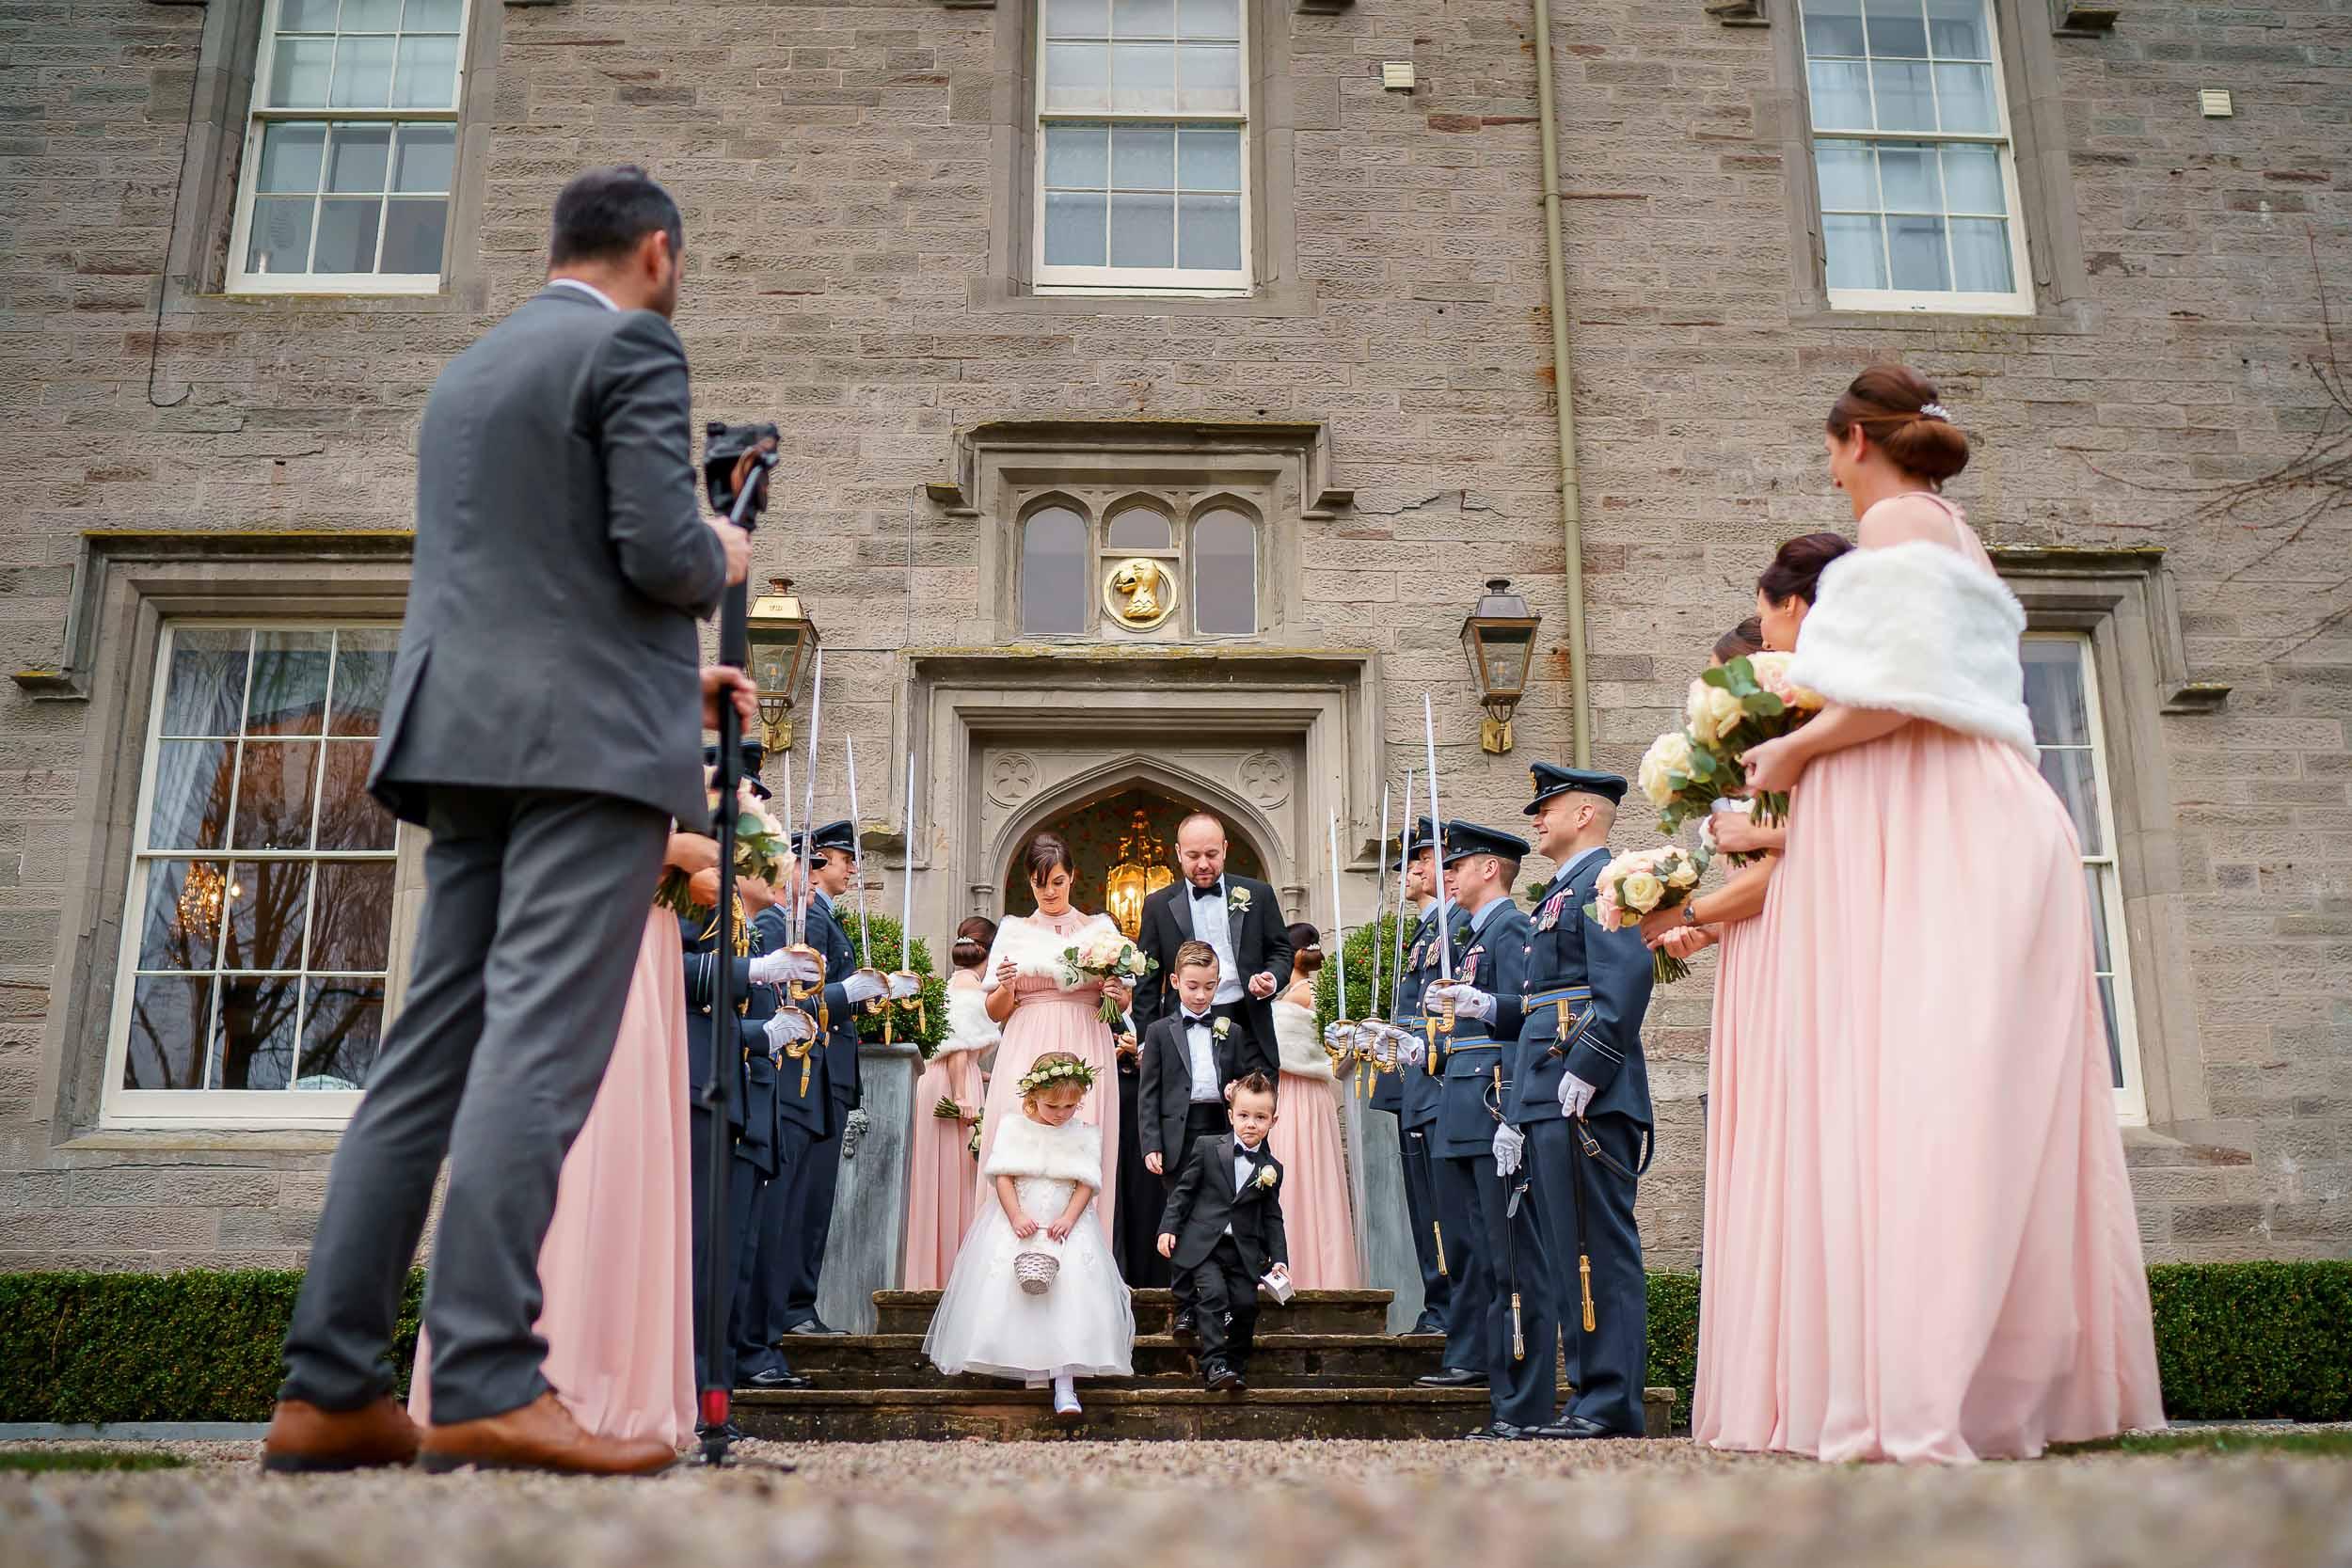 Wedding Photography, Lemore, Manor, Lemore Manor, Herefordshire, Wedding, Photographer, David, Liebst, David Liebst